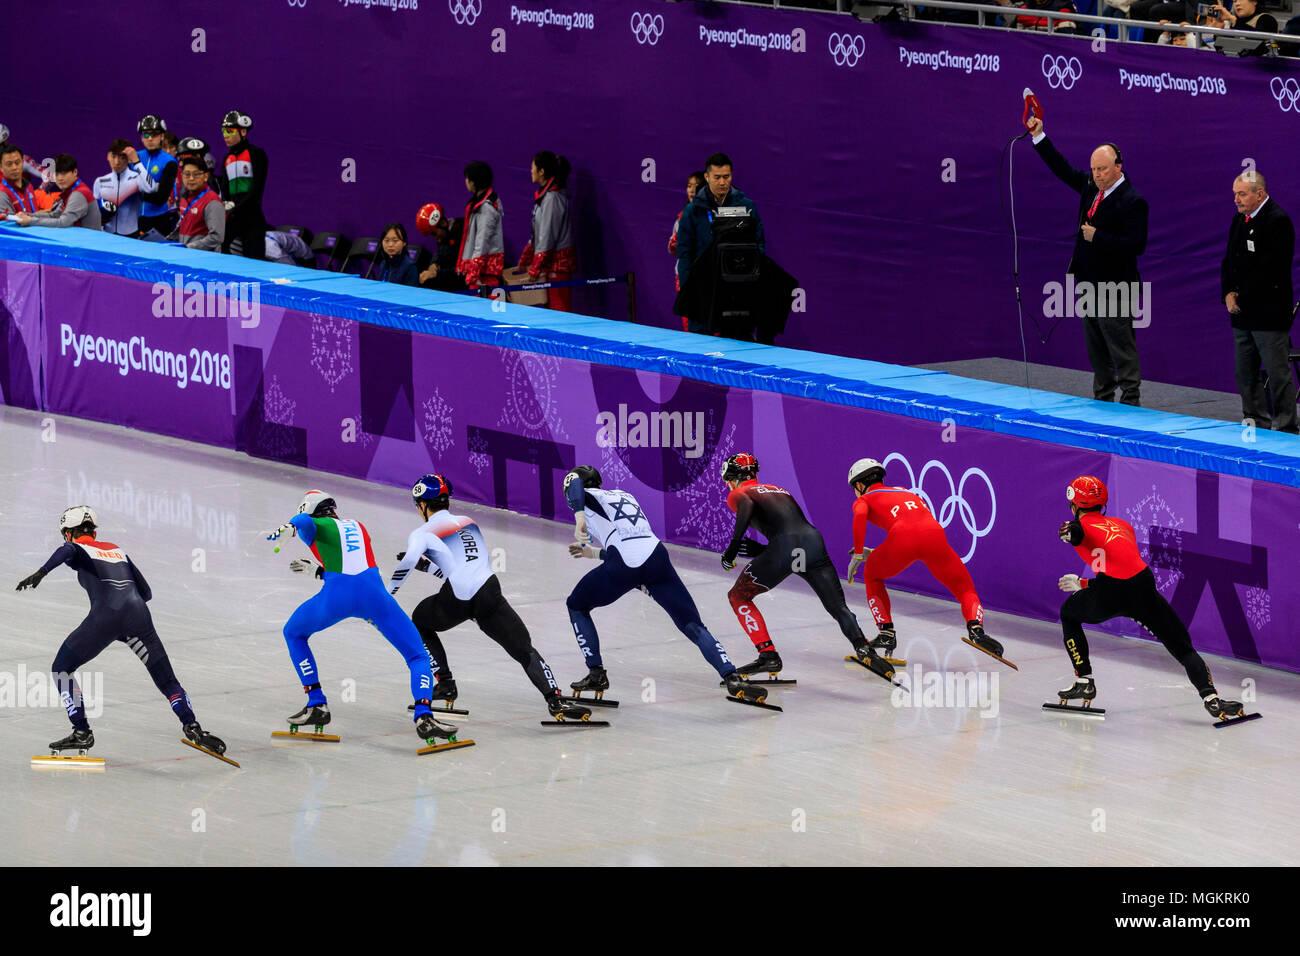 Itzhak De Laat (NED),Tommaso Dotti (ITA), Daeheon Hwang (KOR), Vladislav Bykanov (ISR), Pascal Dion (CAN), chanson de l'ONU Choe (PKR) et Wu Dajing (CHN) à Photo Stock